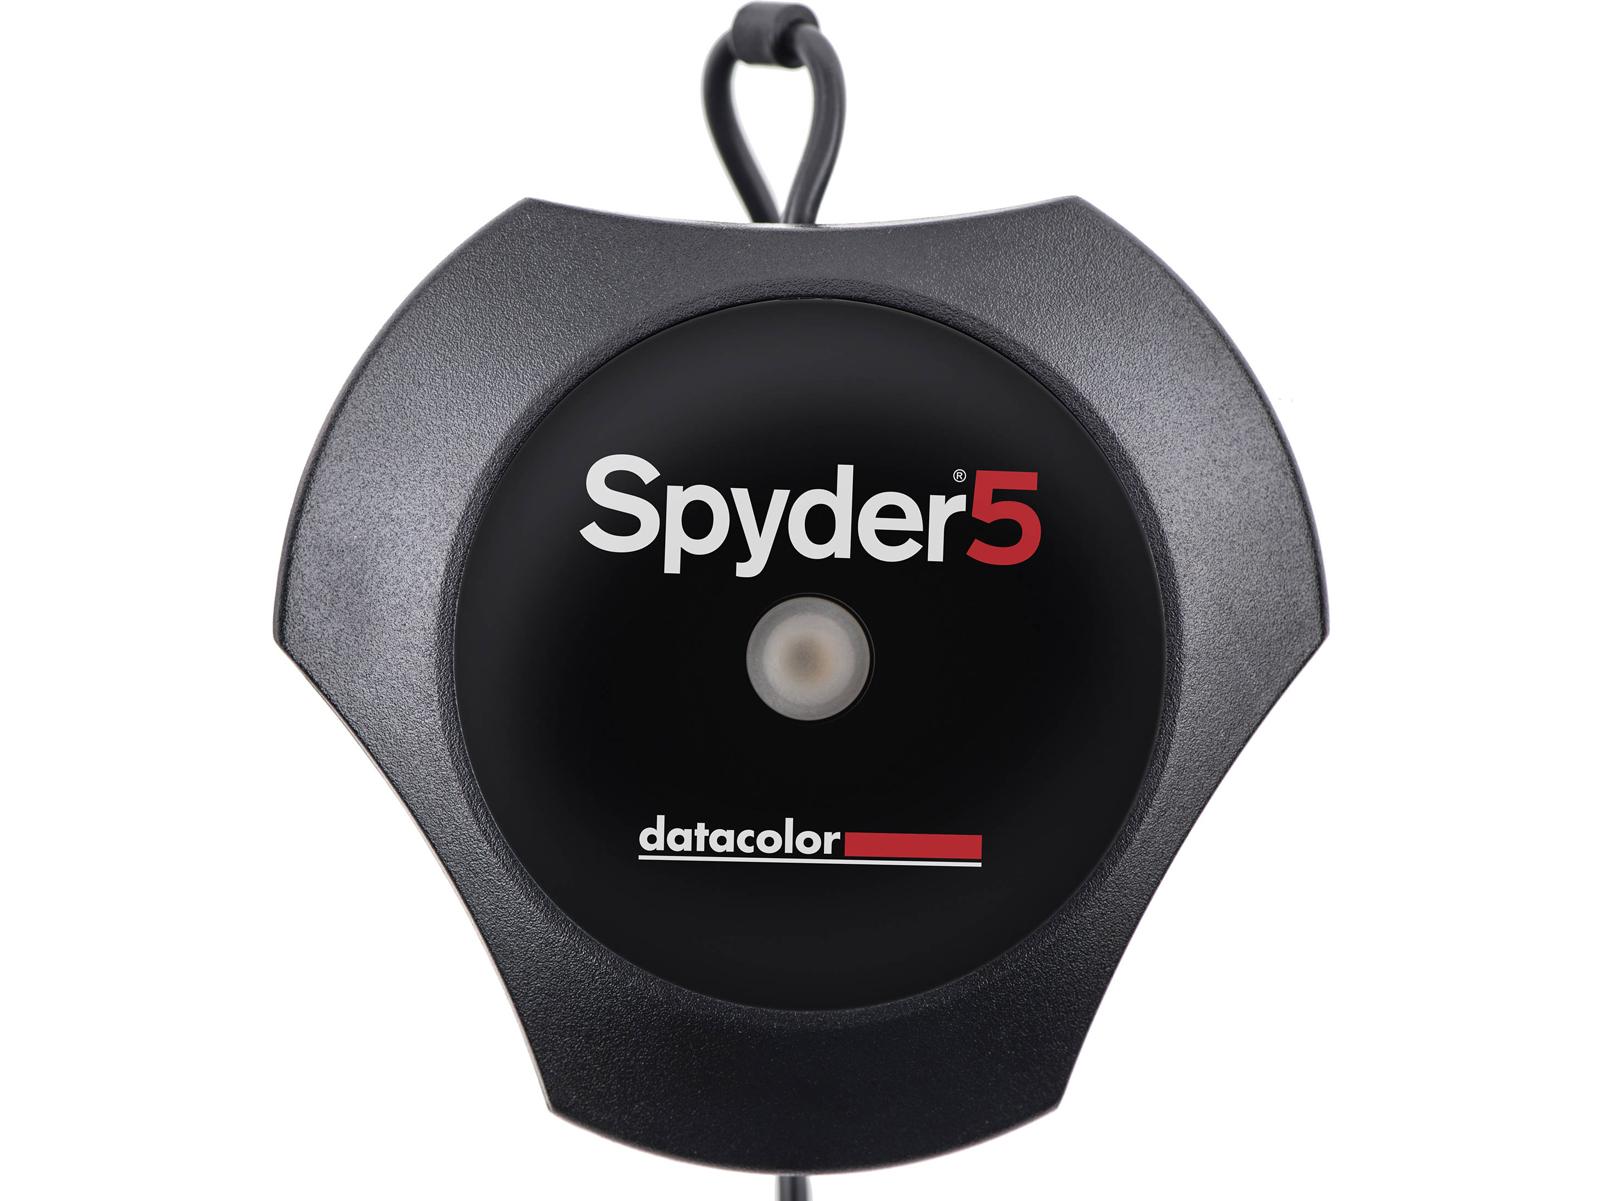 Datacolor 推出全新 Spyder5 色彩管理产品